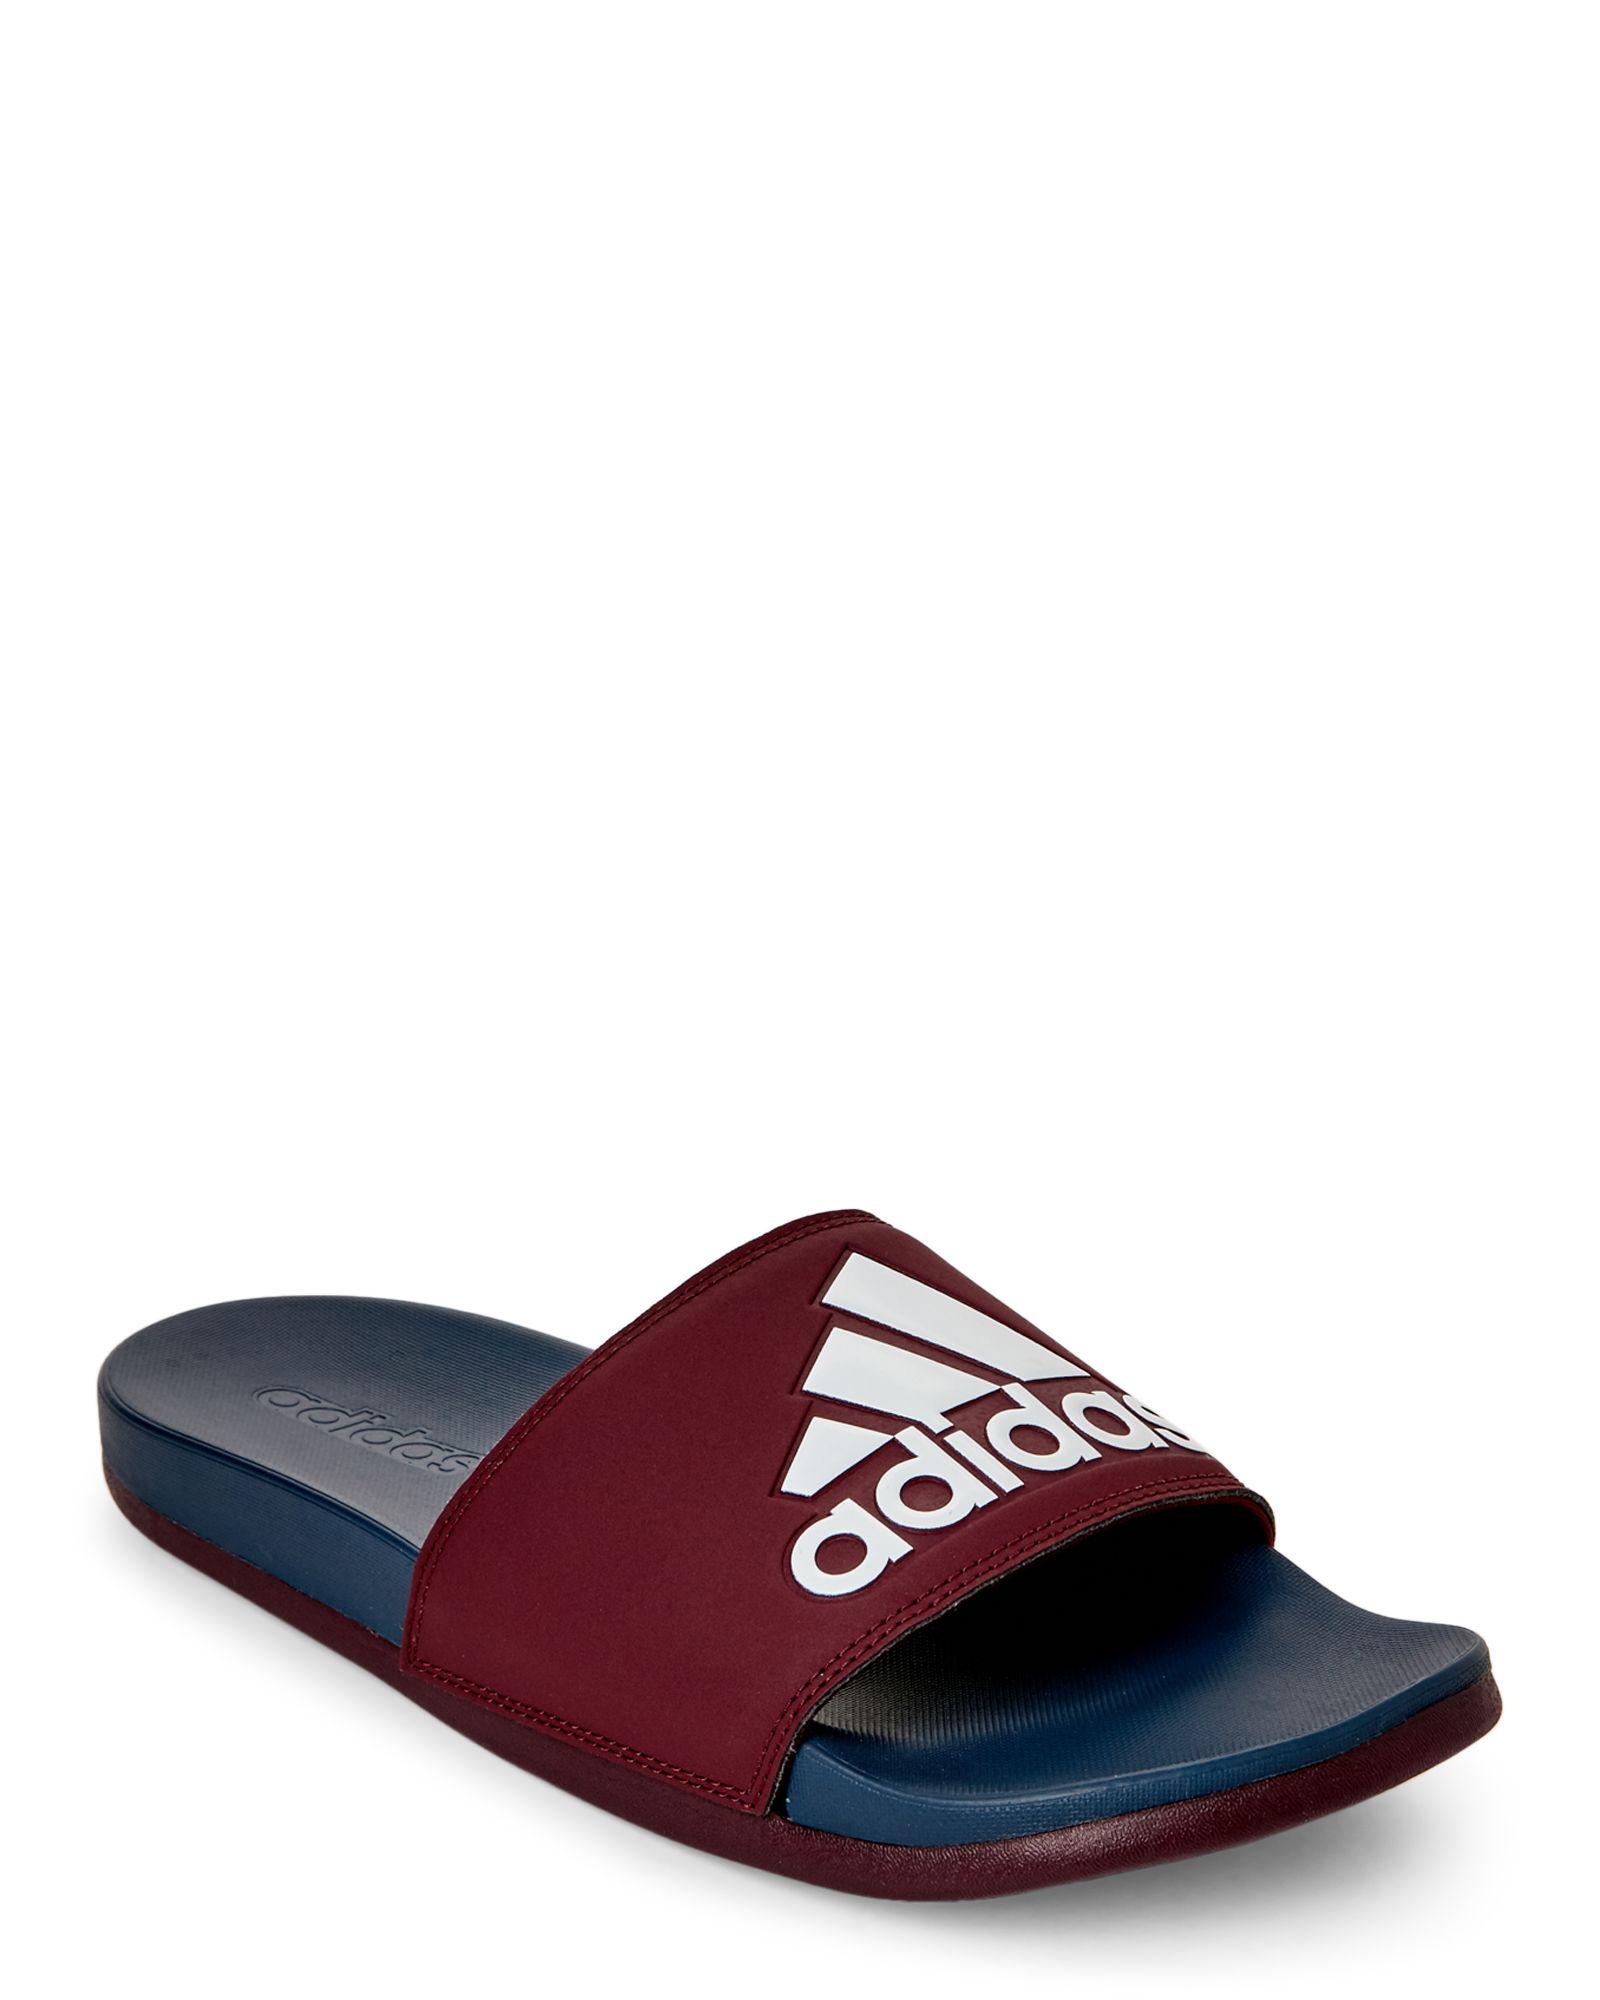 4d63d9f9be7c Adidas Adilette CF Logo Slide Sandals